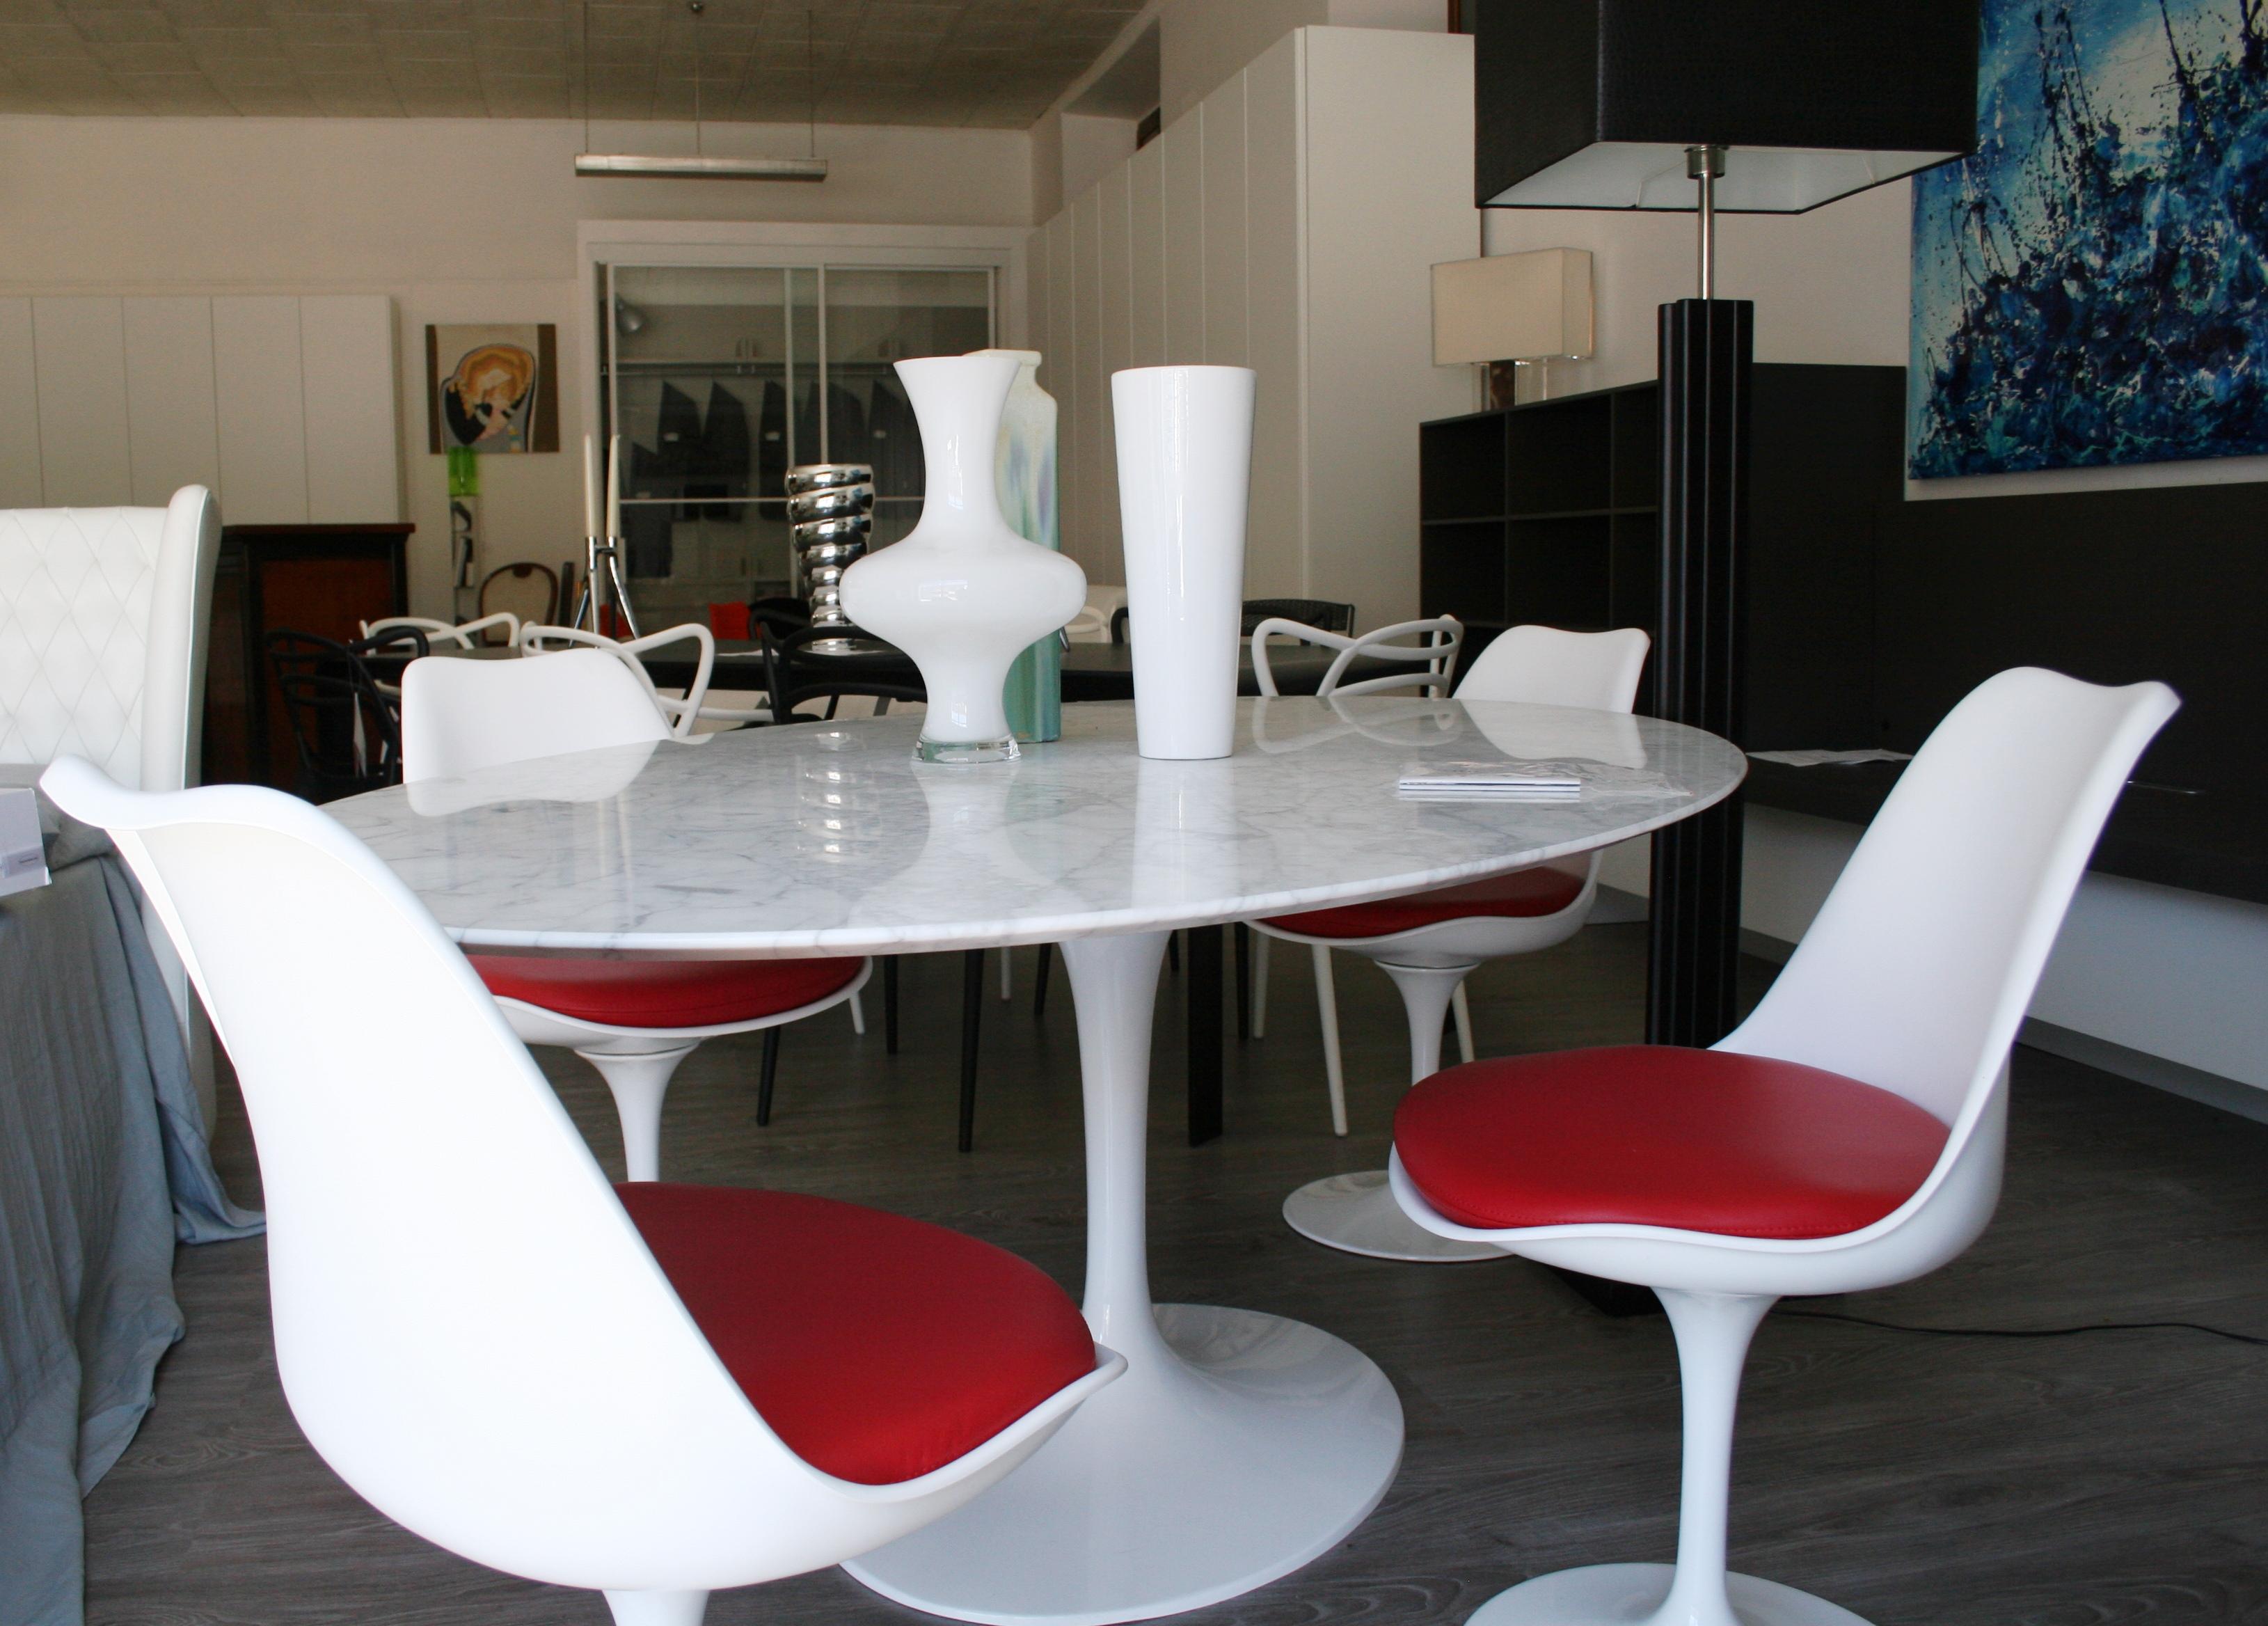 Tavoli ovali moderni i tavoli allungabili calligaris per for Tavoli allungabili ovali moderni